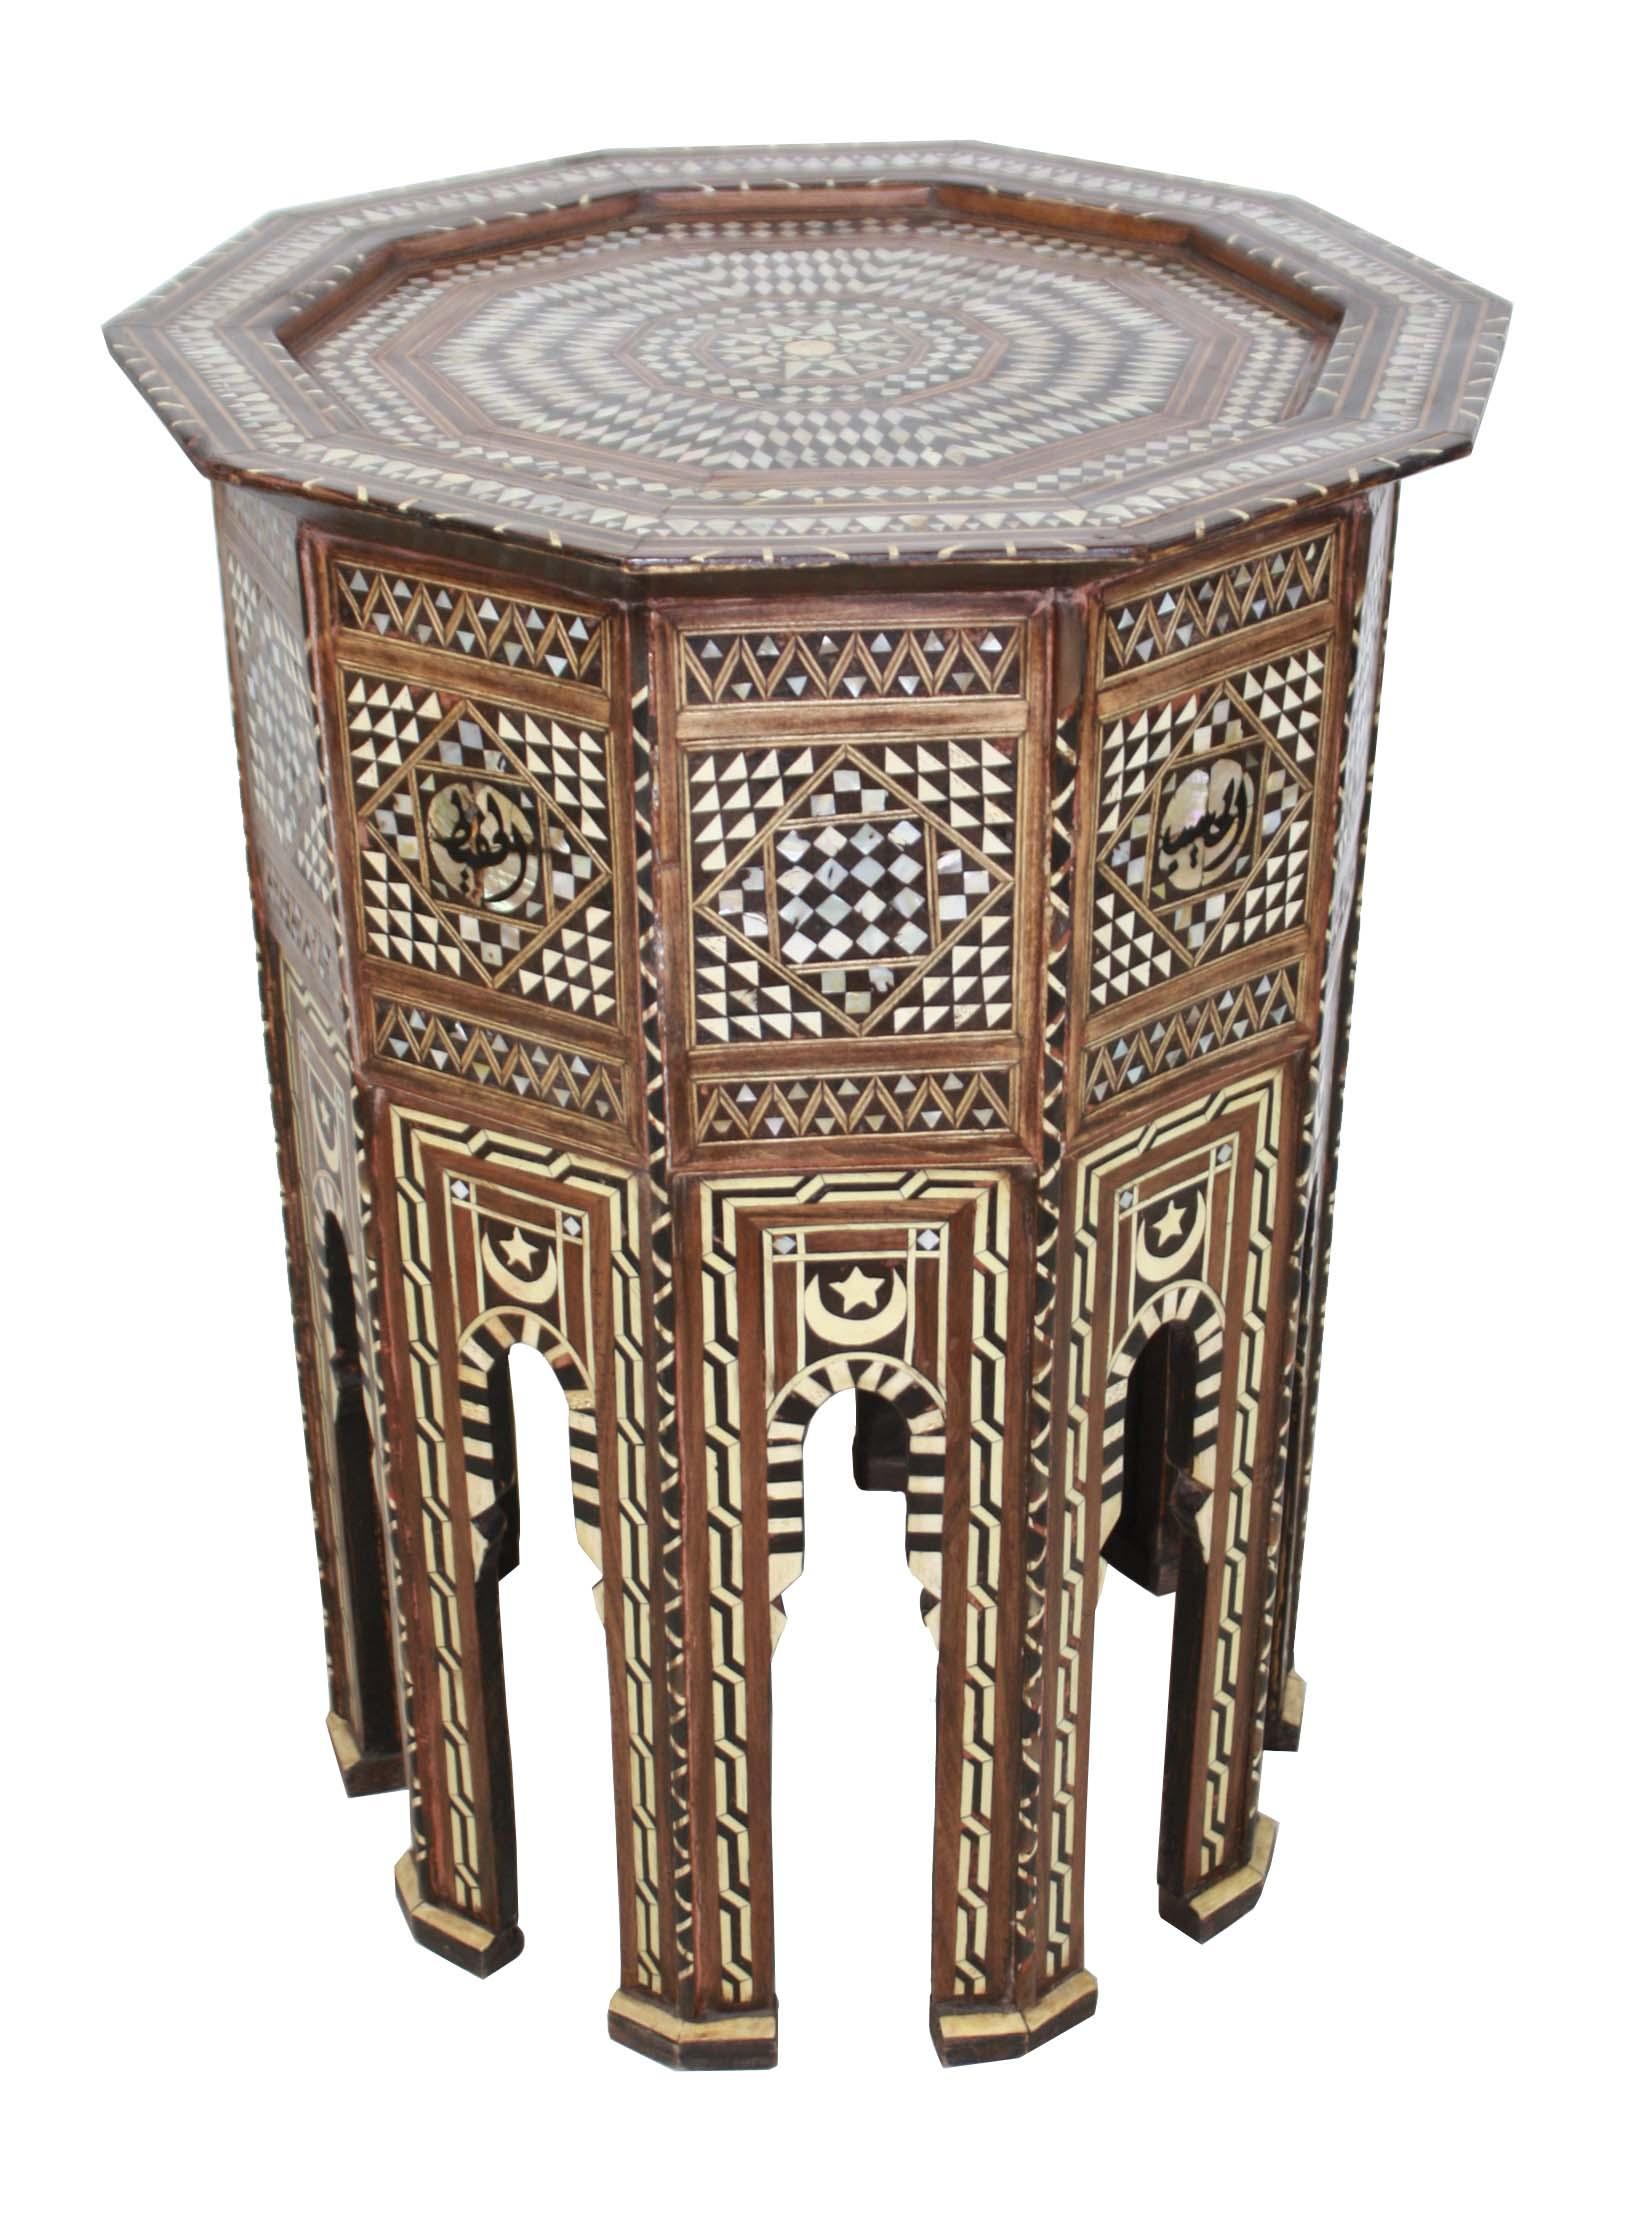 syrian-dining-room-furniture-new-york-mop-st070-1.jpg